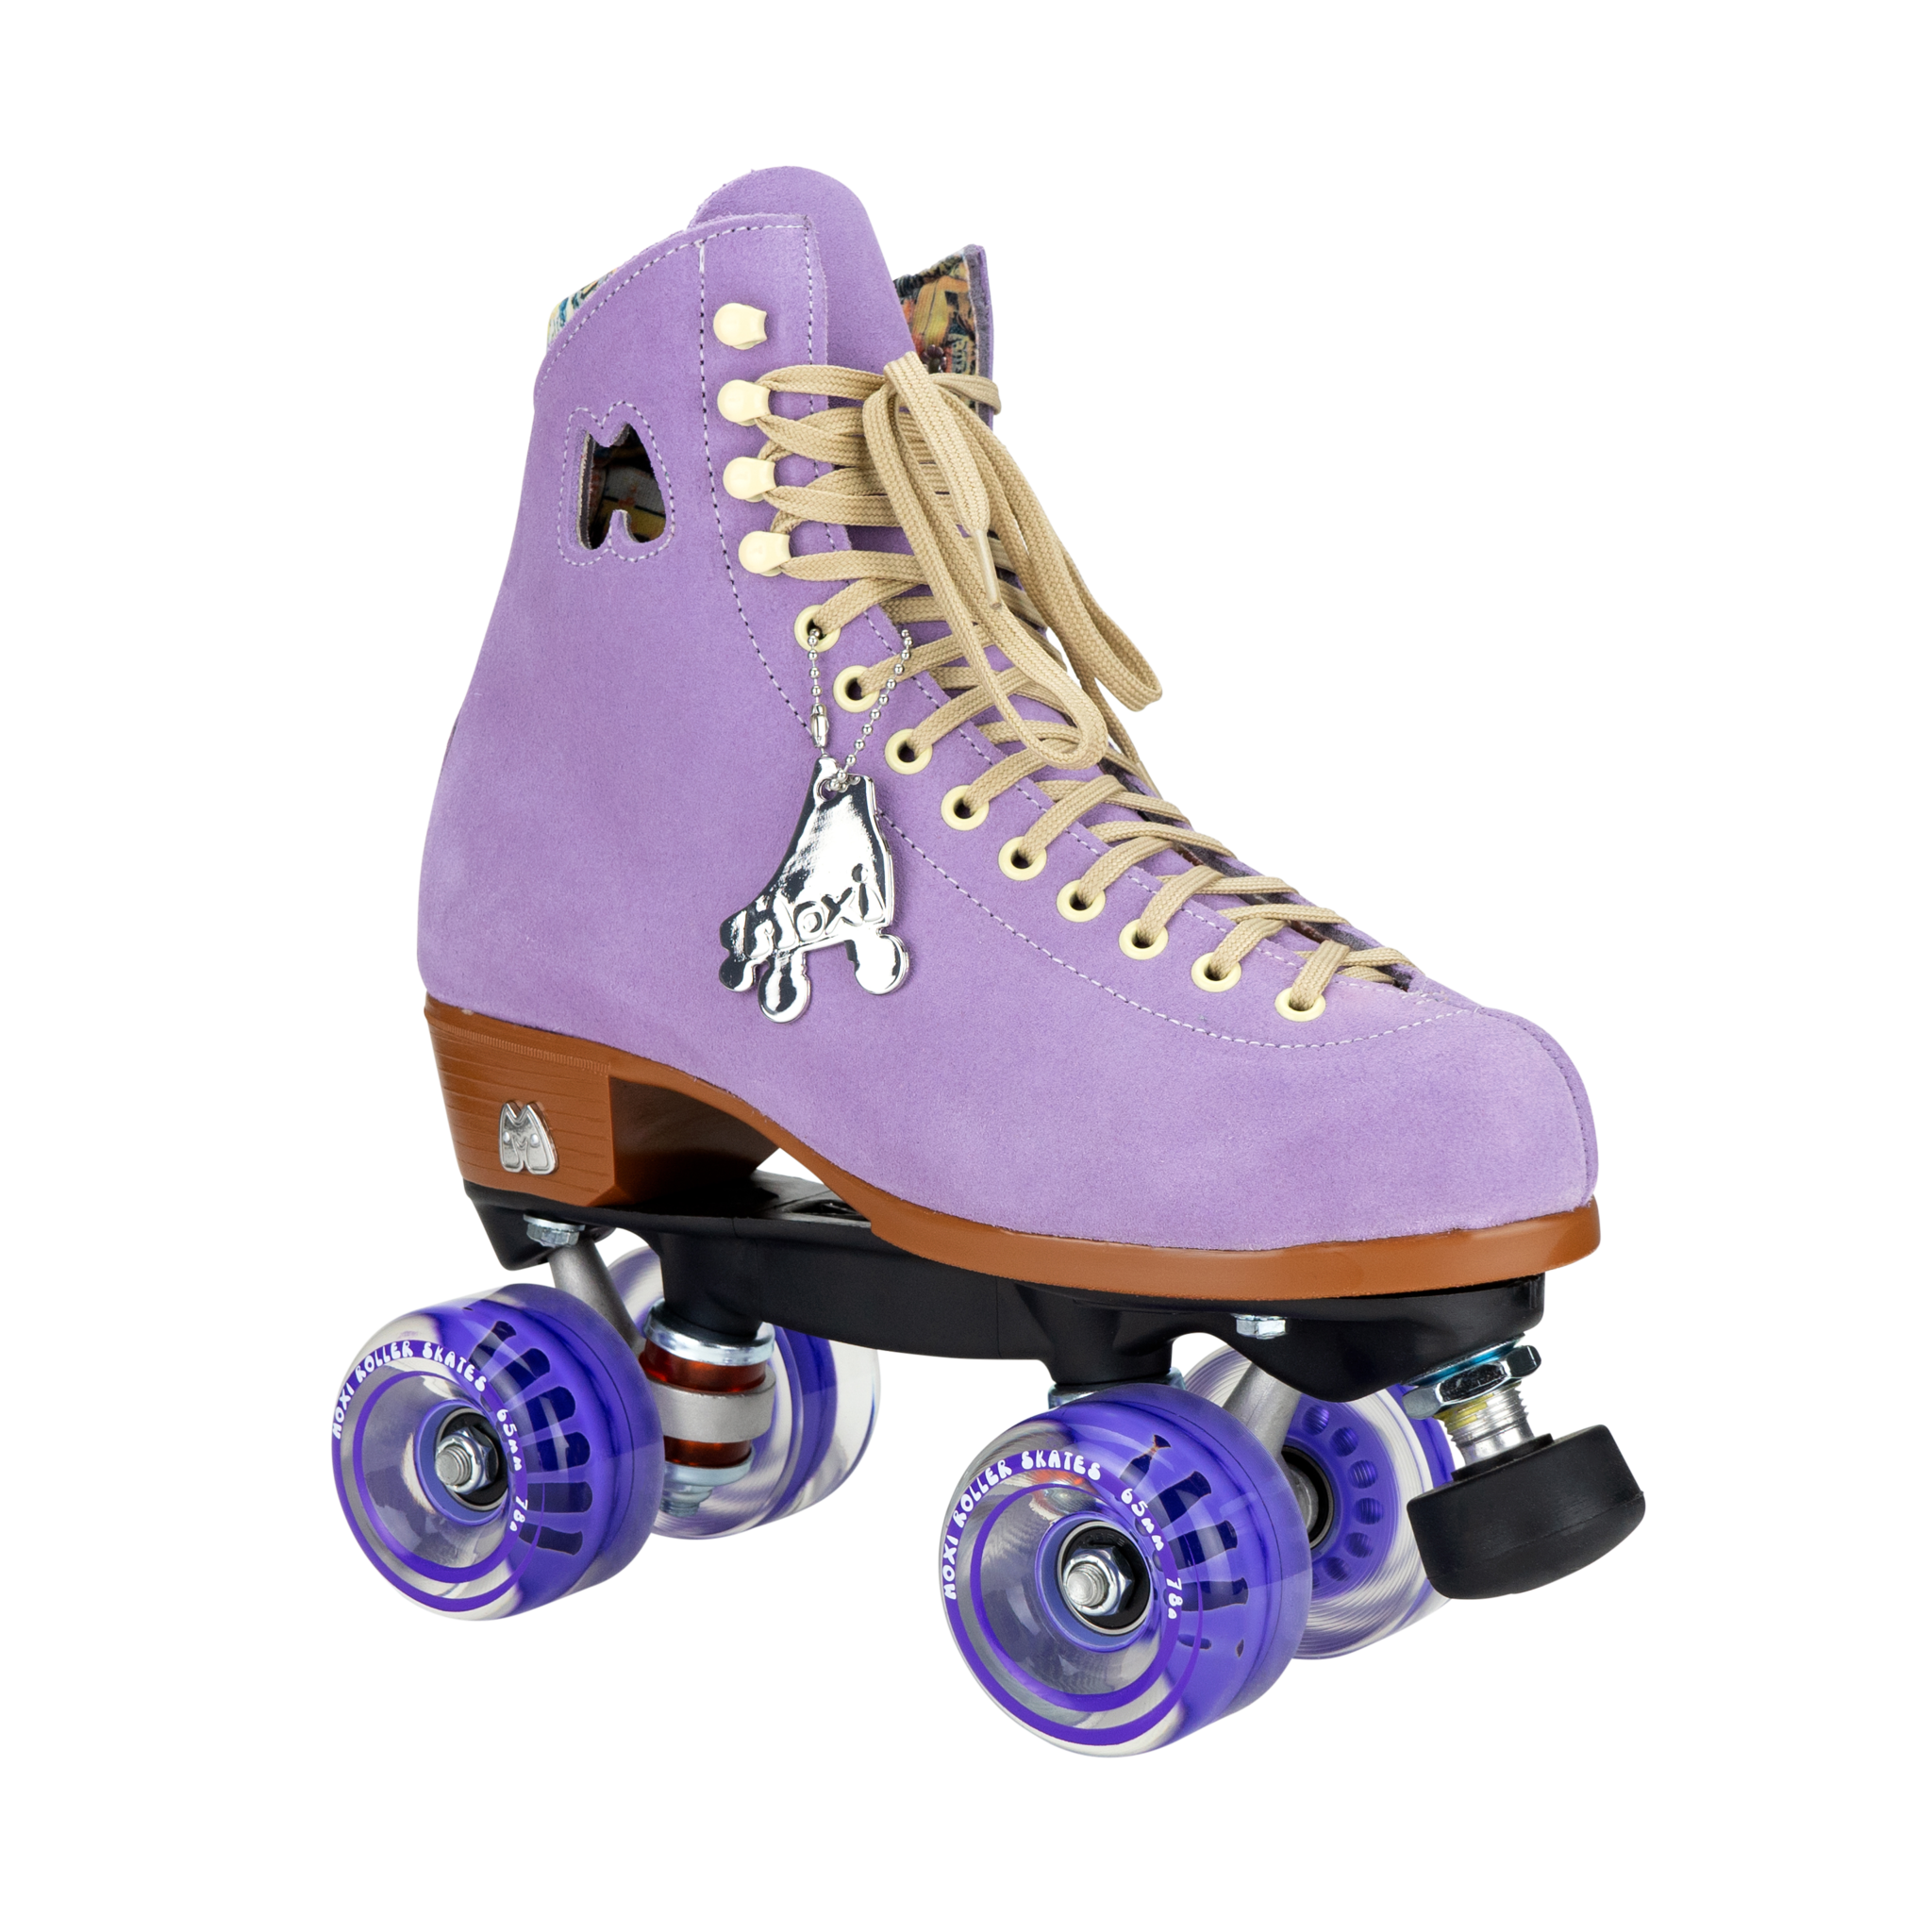 Moxi Lolly Skates Lilac